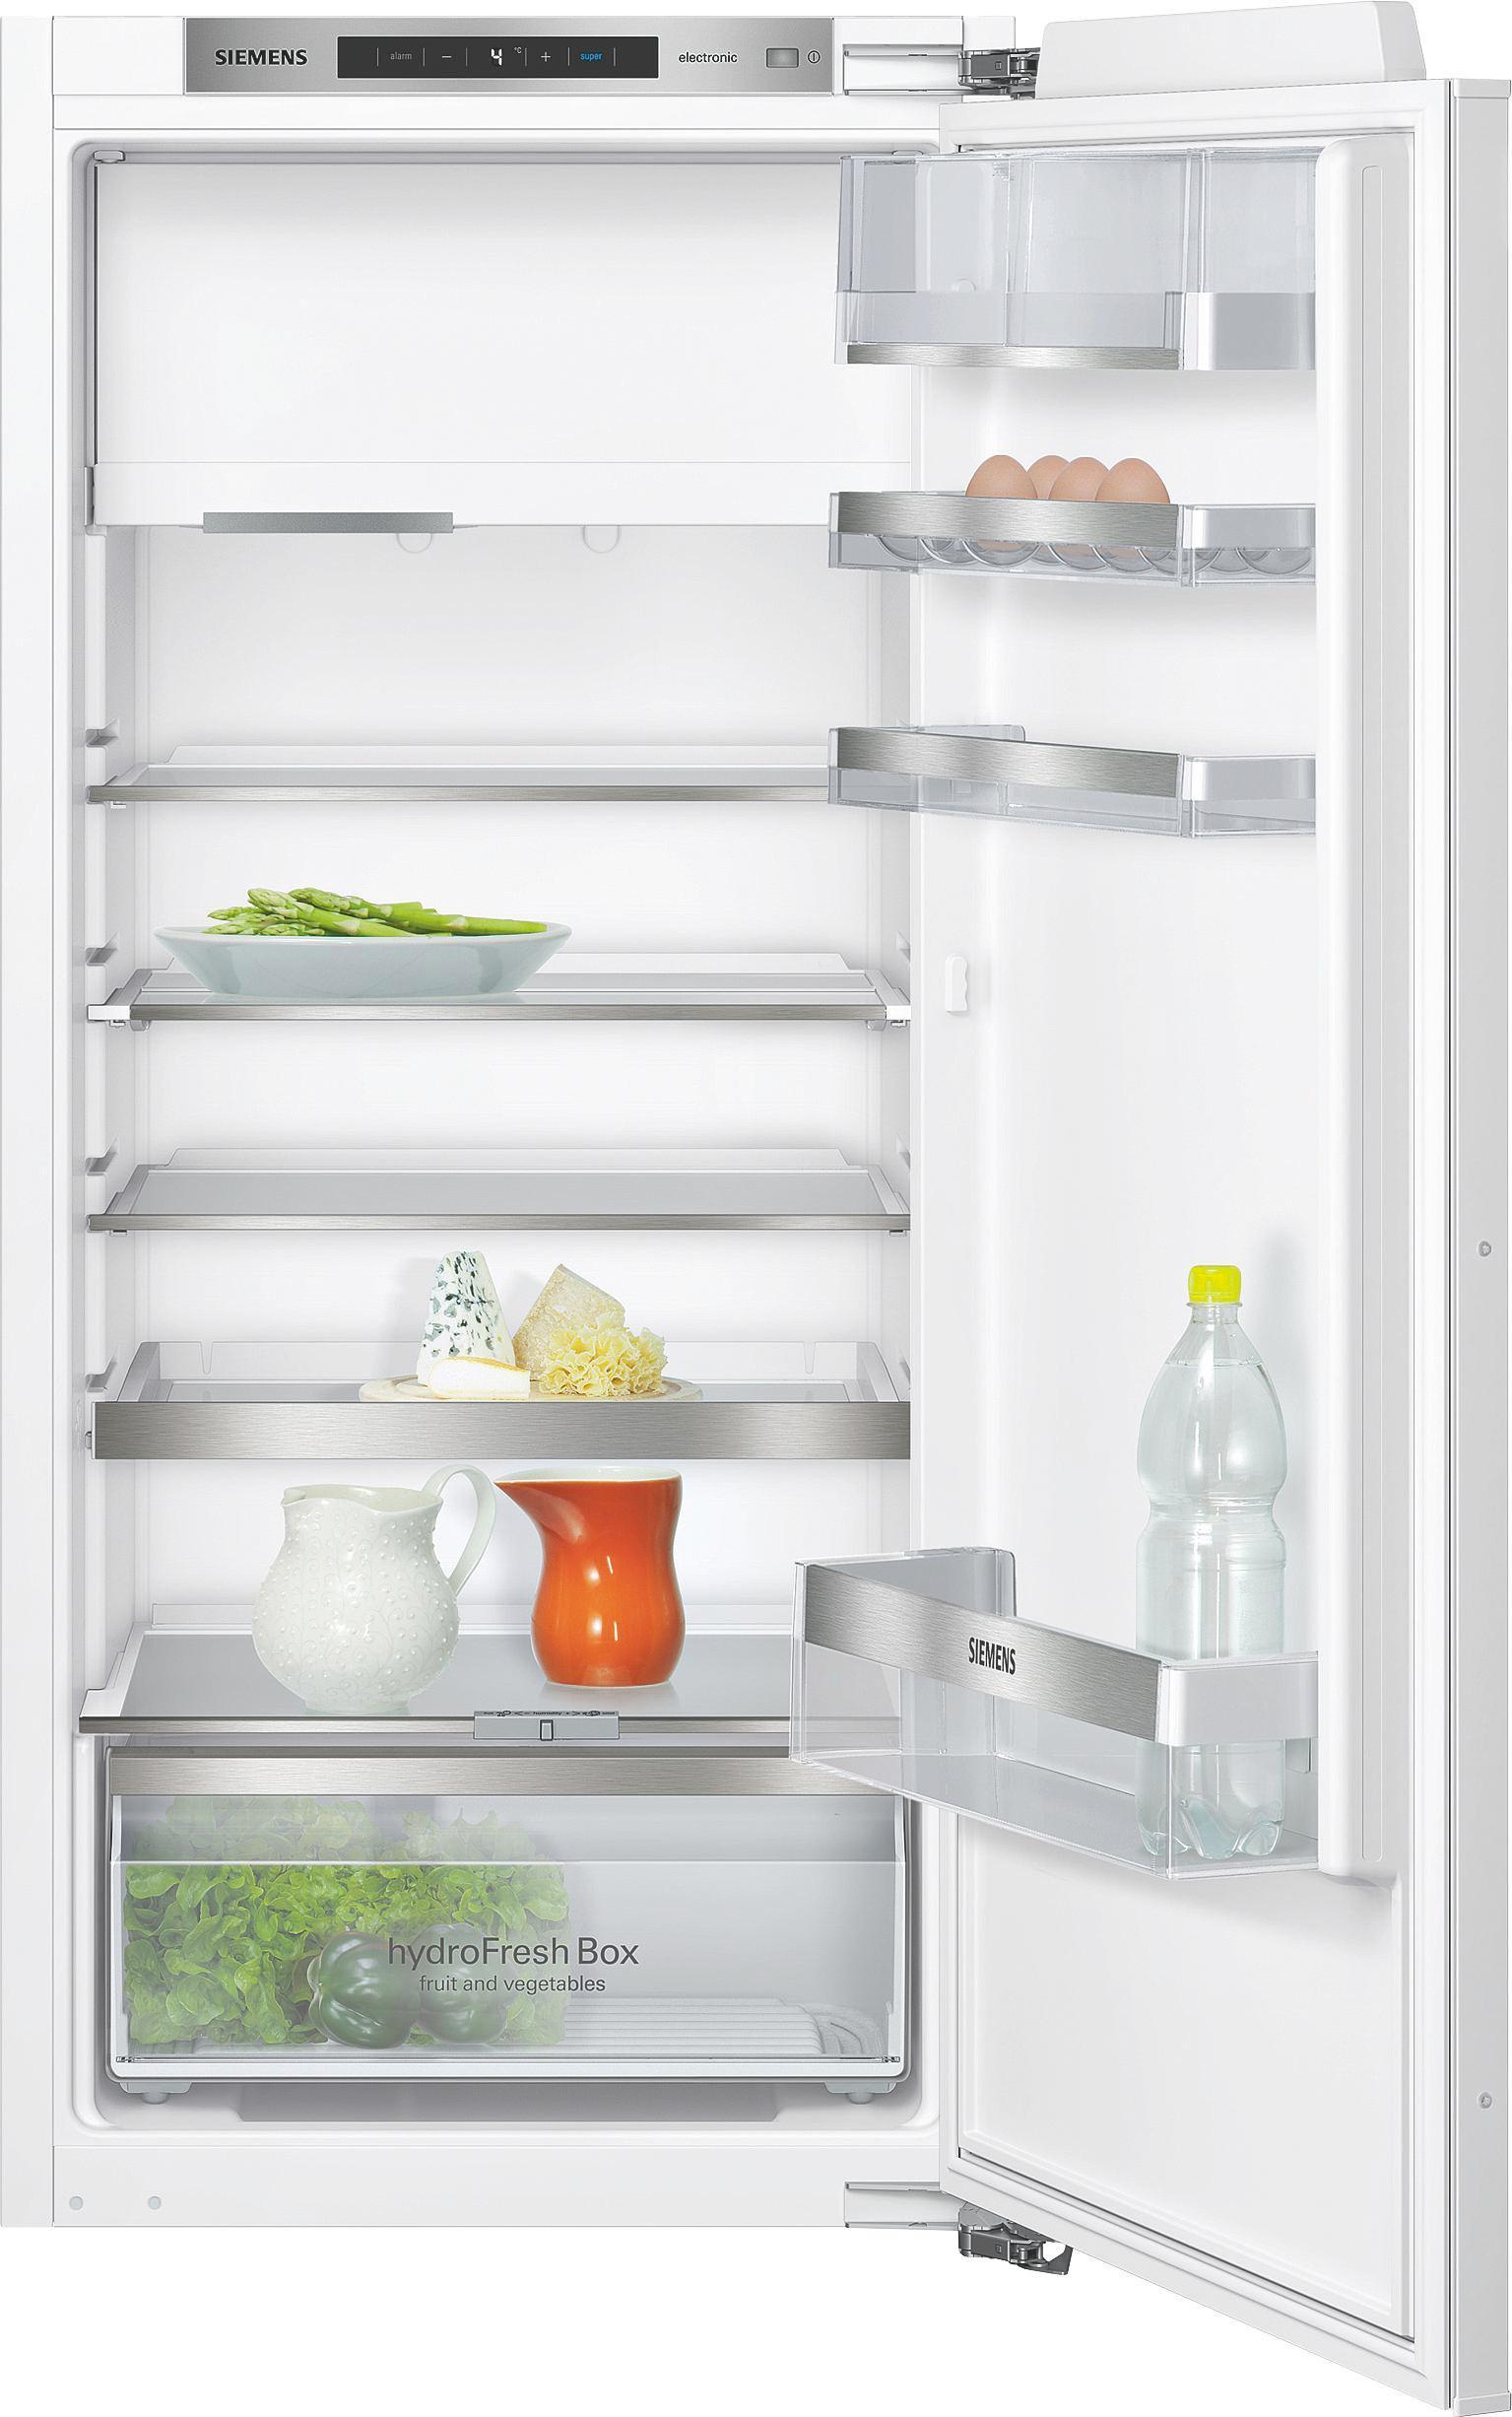 Kühlschrank Siemens Ki42lad30, EEZ A++ - MODERN (55,8/122,1/54,5cm) - SIEMENS